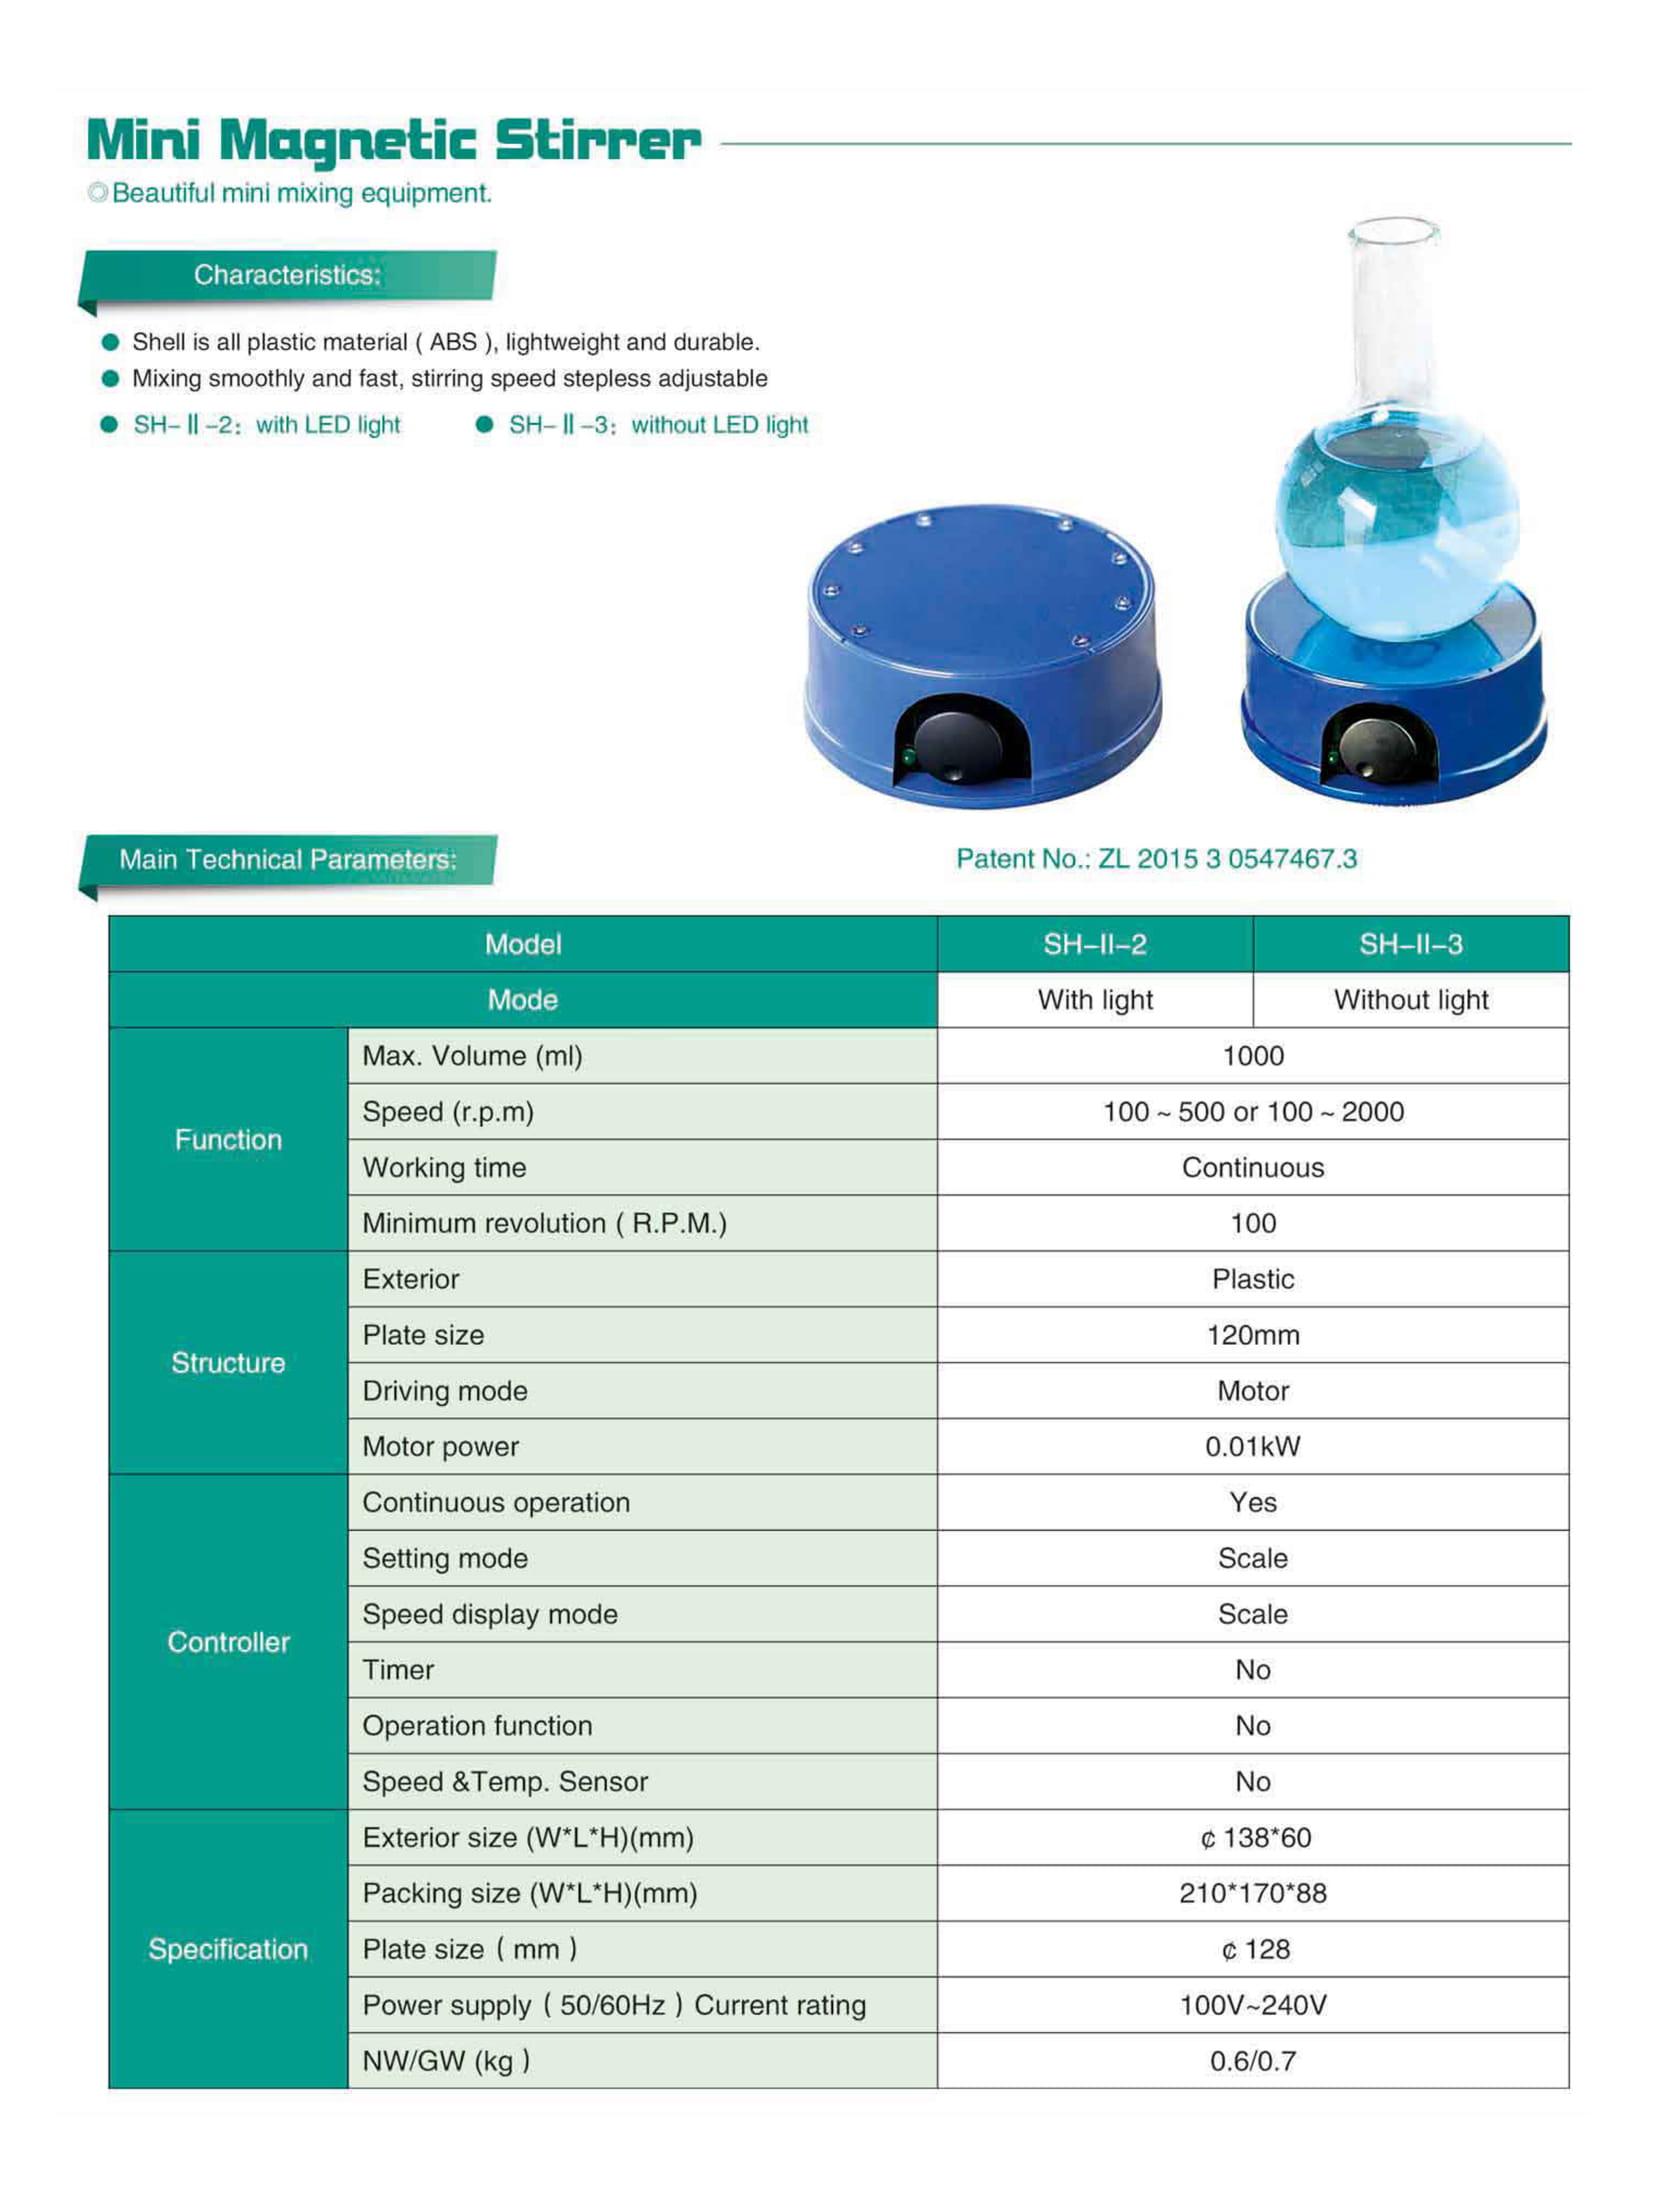 Mini-Magnetic-Stirrer